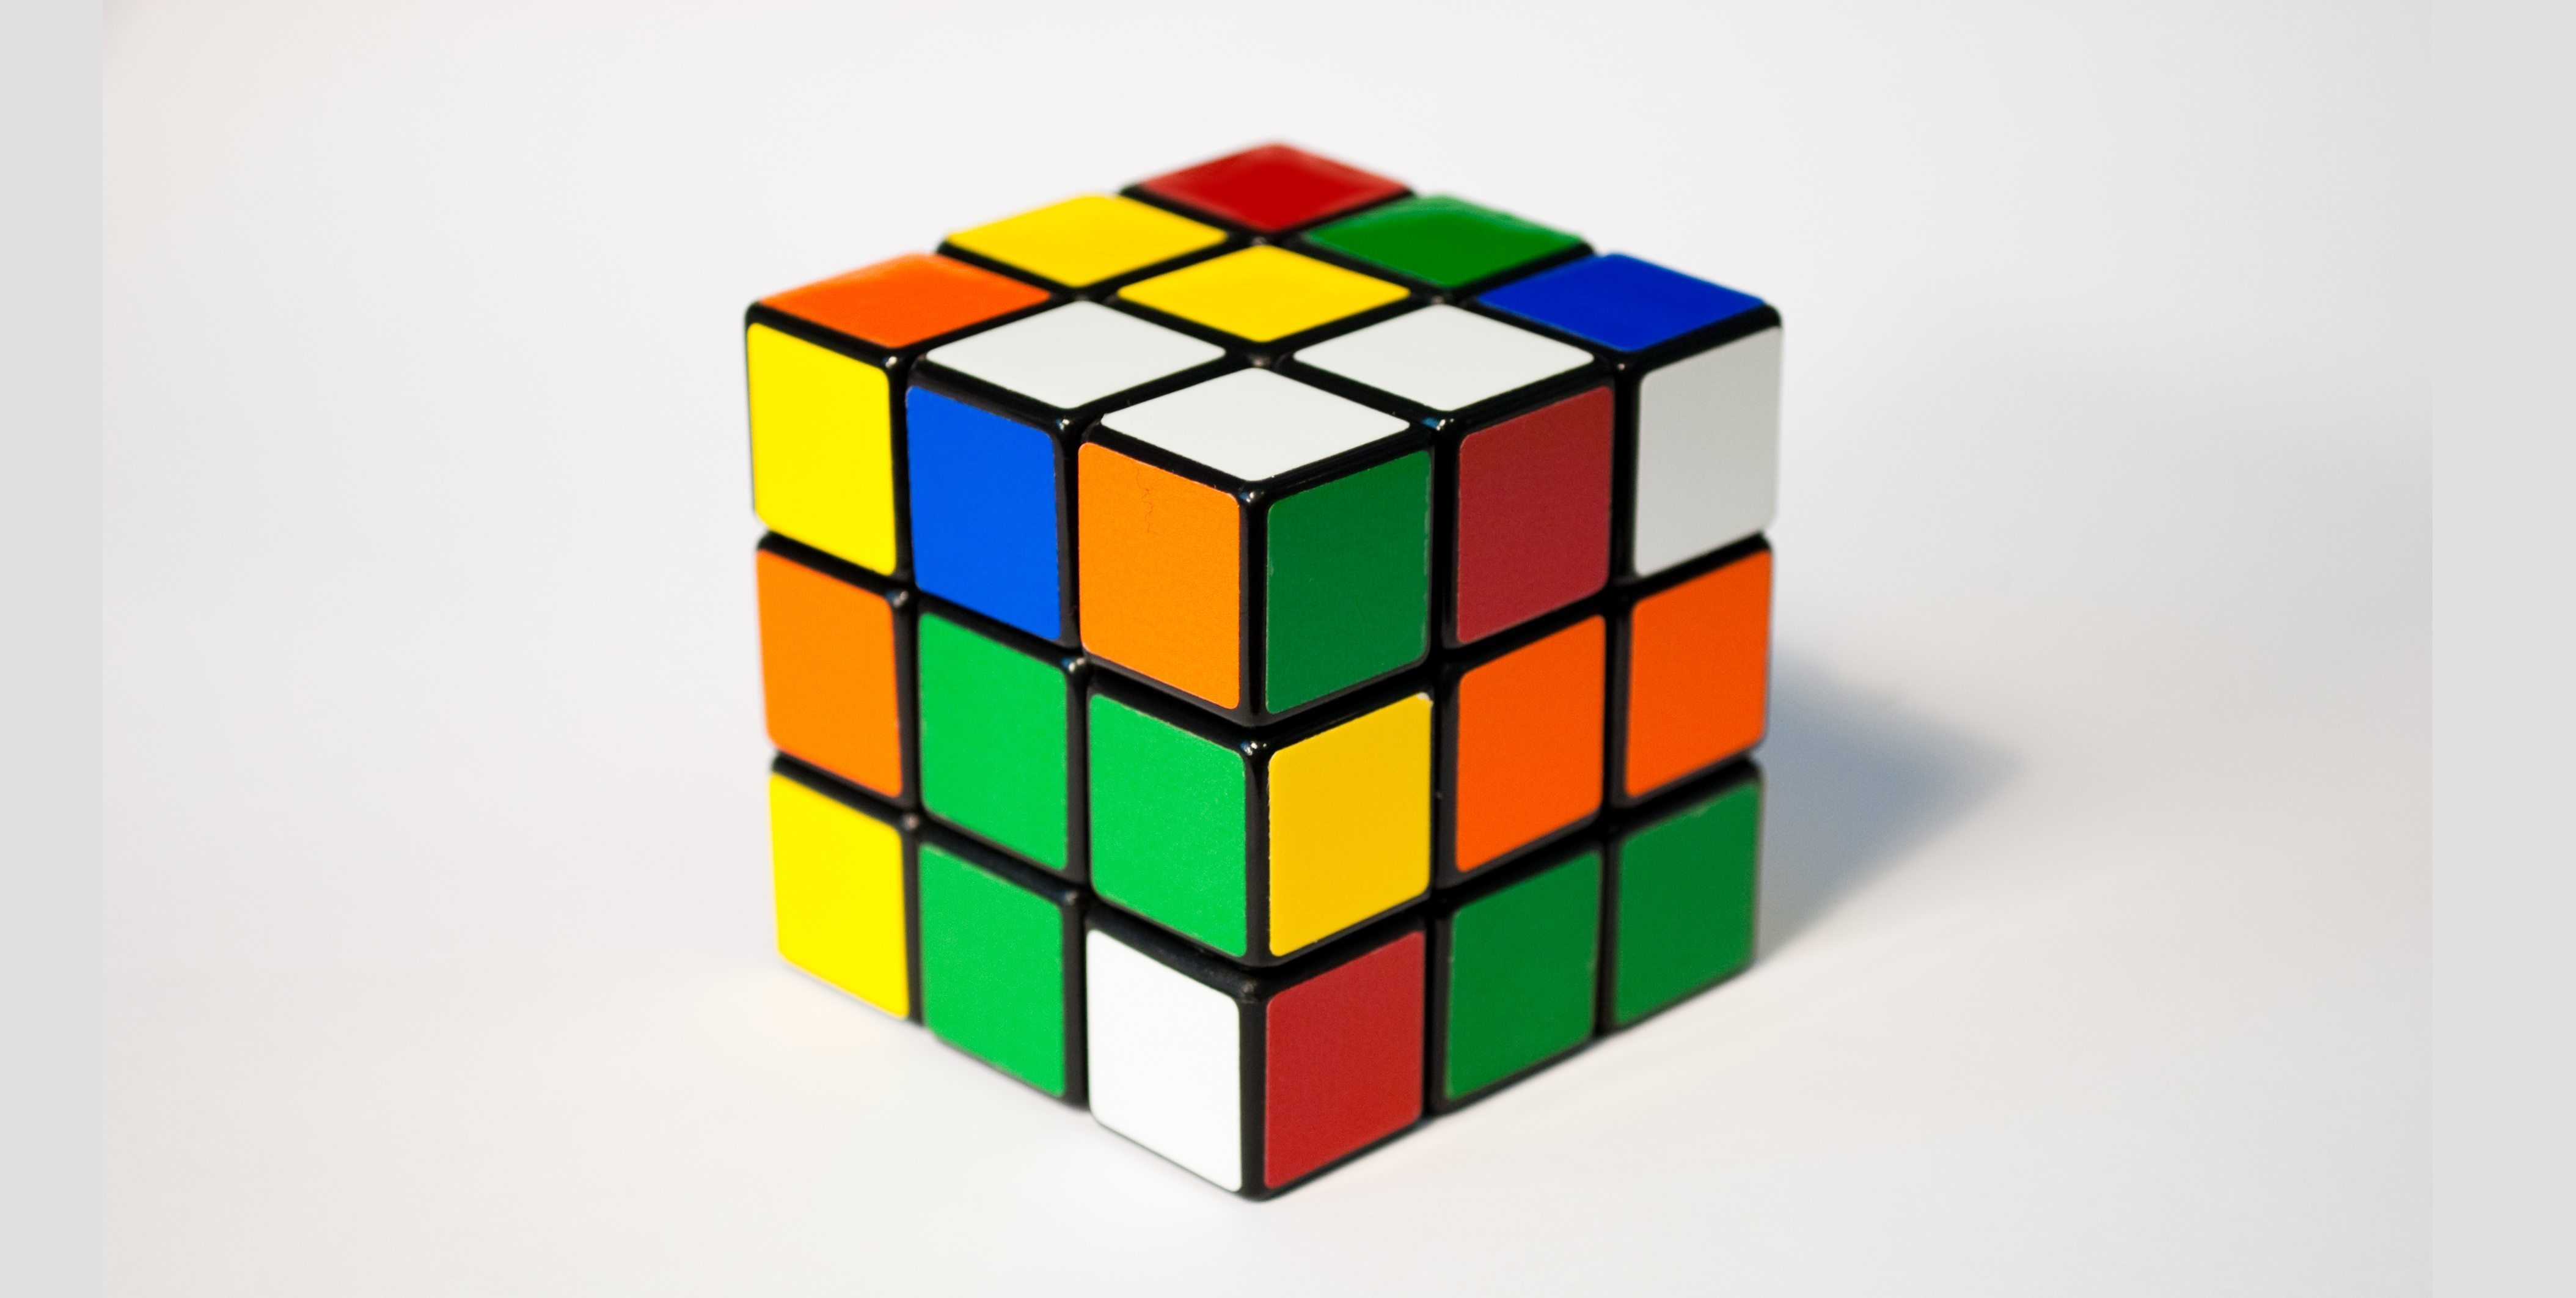 (http://en.wikipedia.org/wiki/User:Acdx) CC-BY-SA-3.0